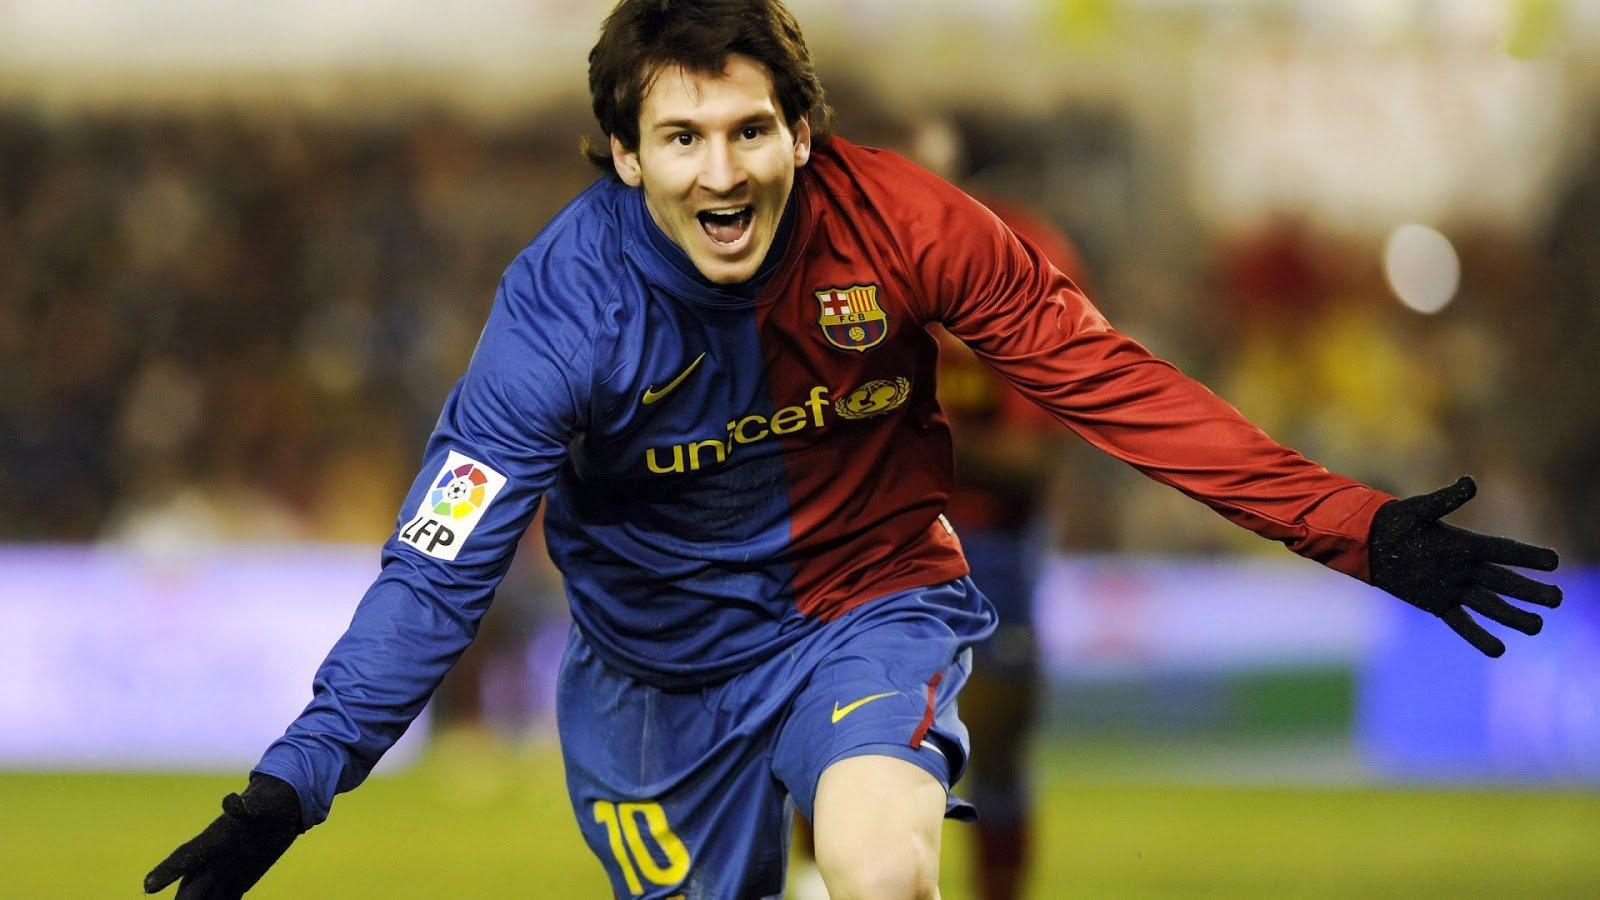 Lionel Messi Football Wallpapers Download Wallpaper Iku 1600x900